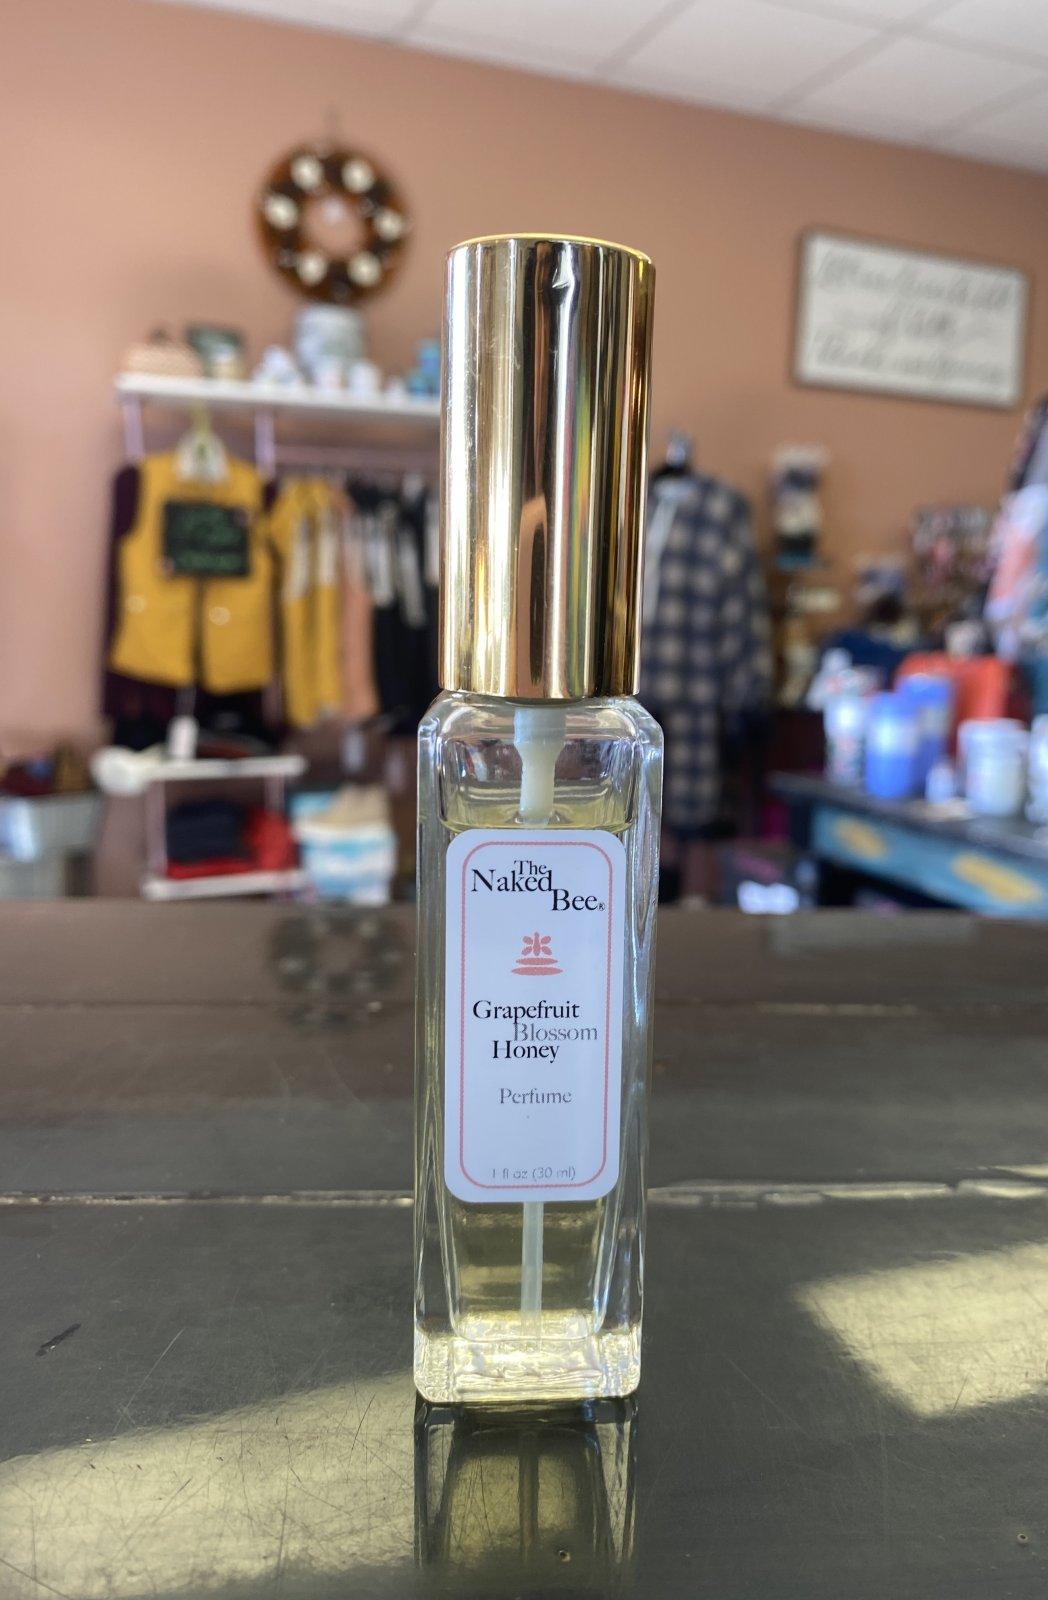 The Naked Bee Perfume Grapefruit Blossom Honey 1 fl oz